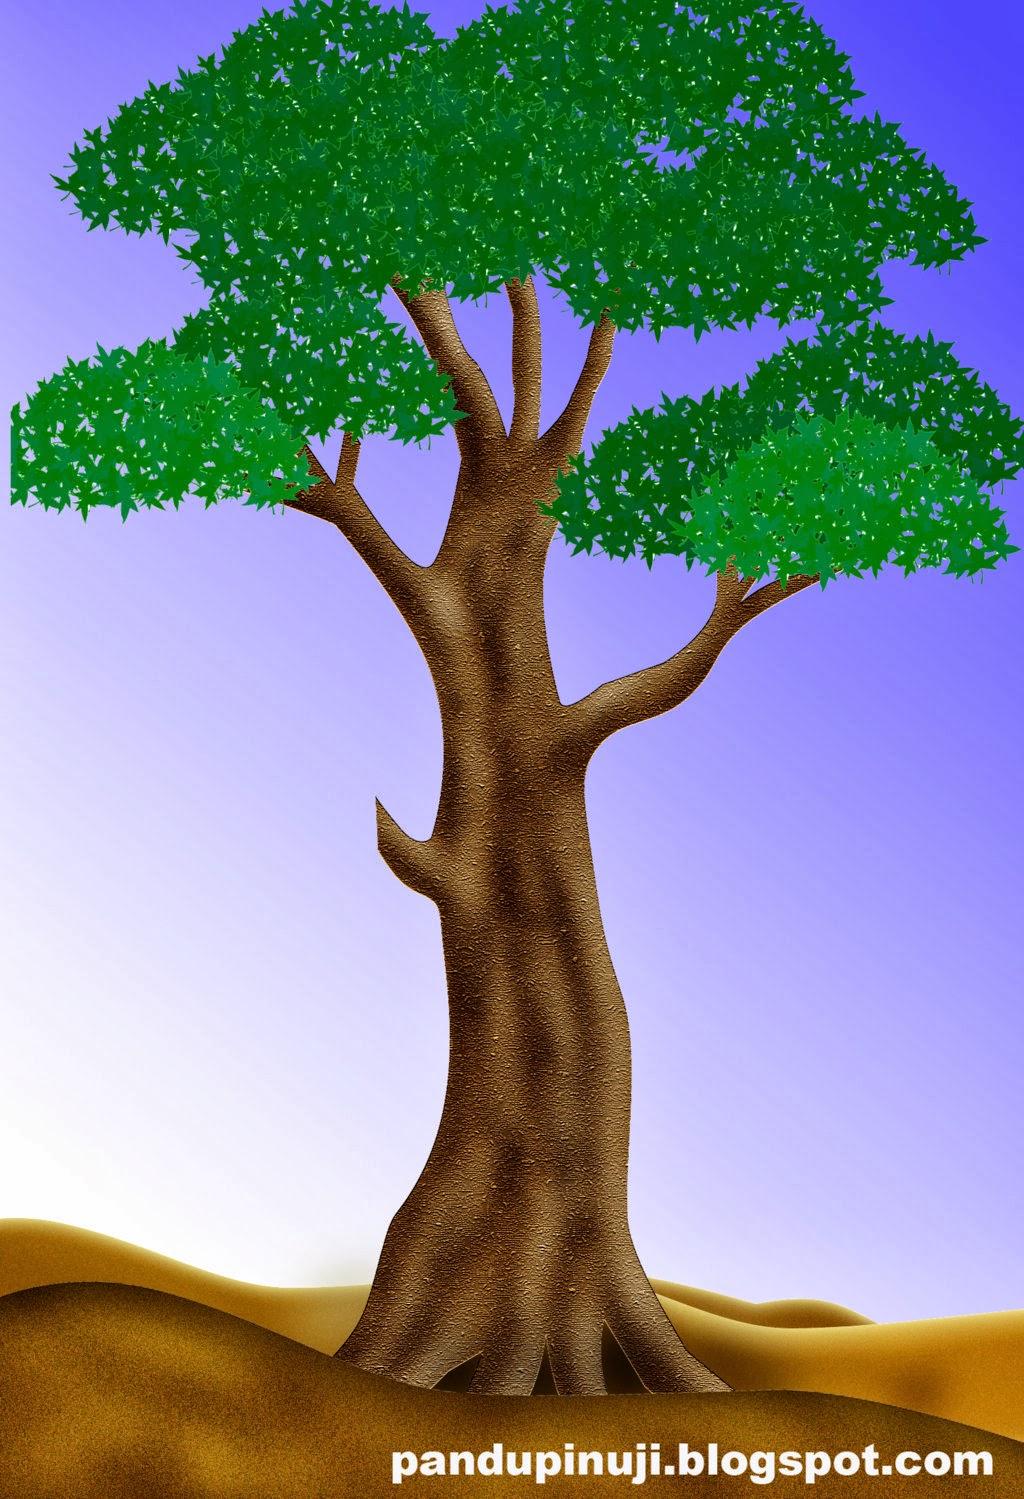 Menggambar Pohon  dengan Photoshop Pandu Pinuji